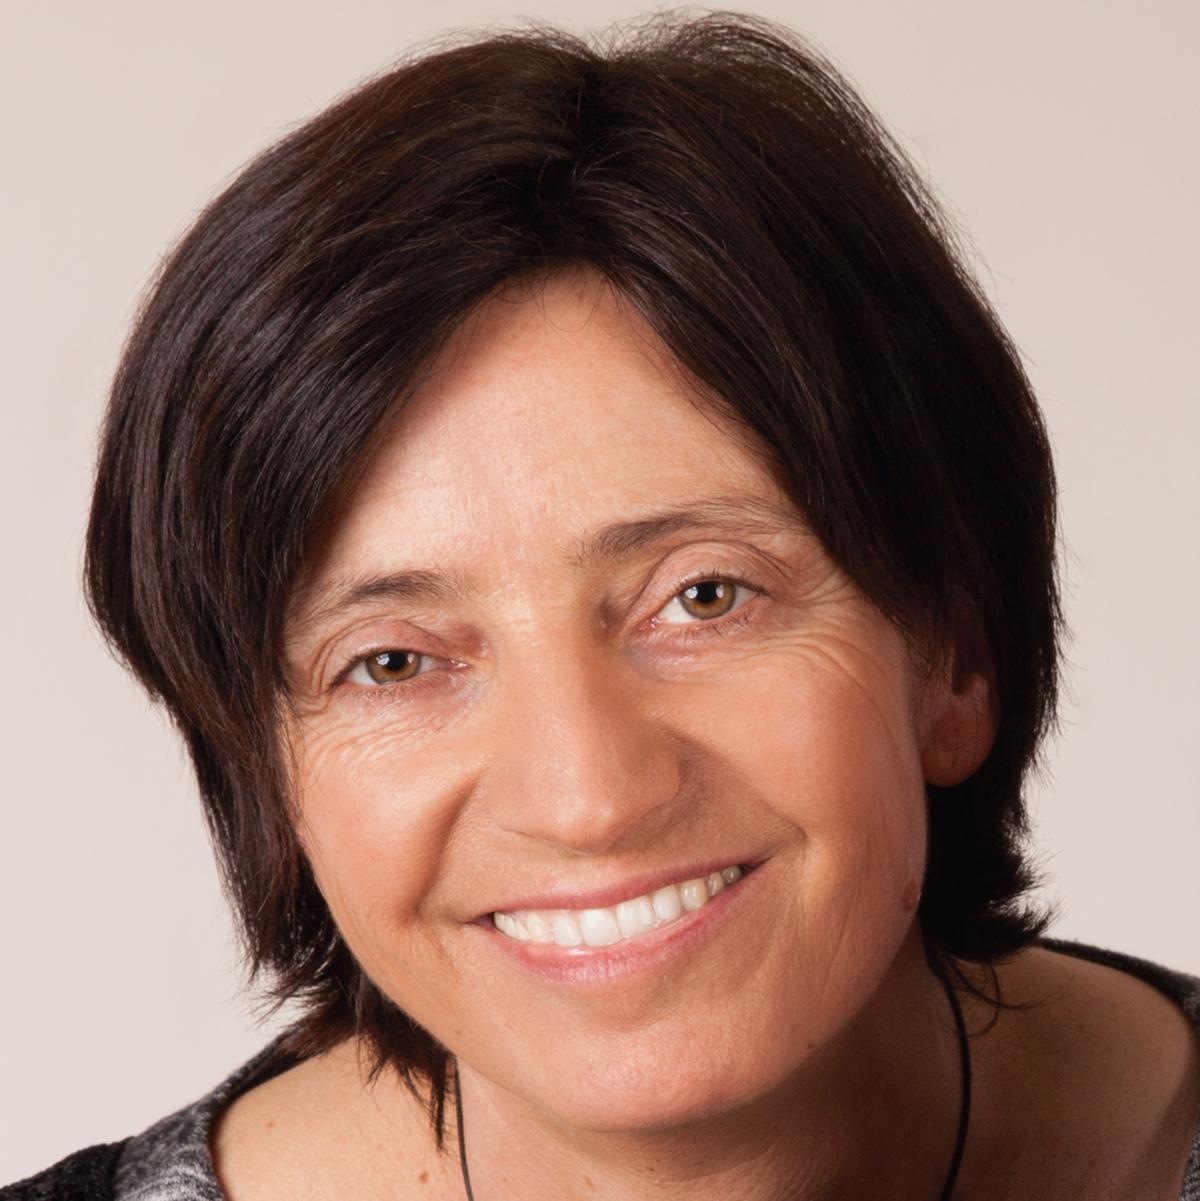 Brigitte Kornberger